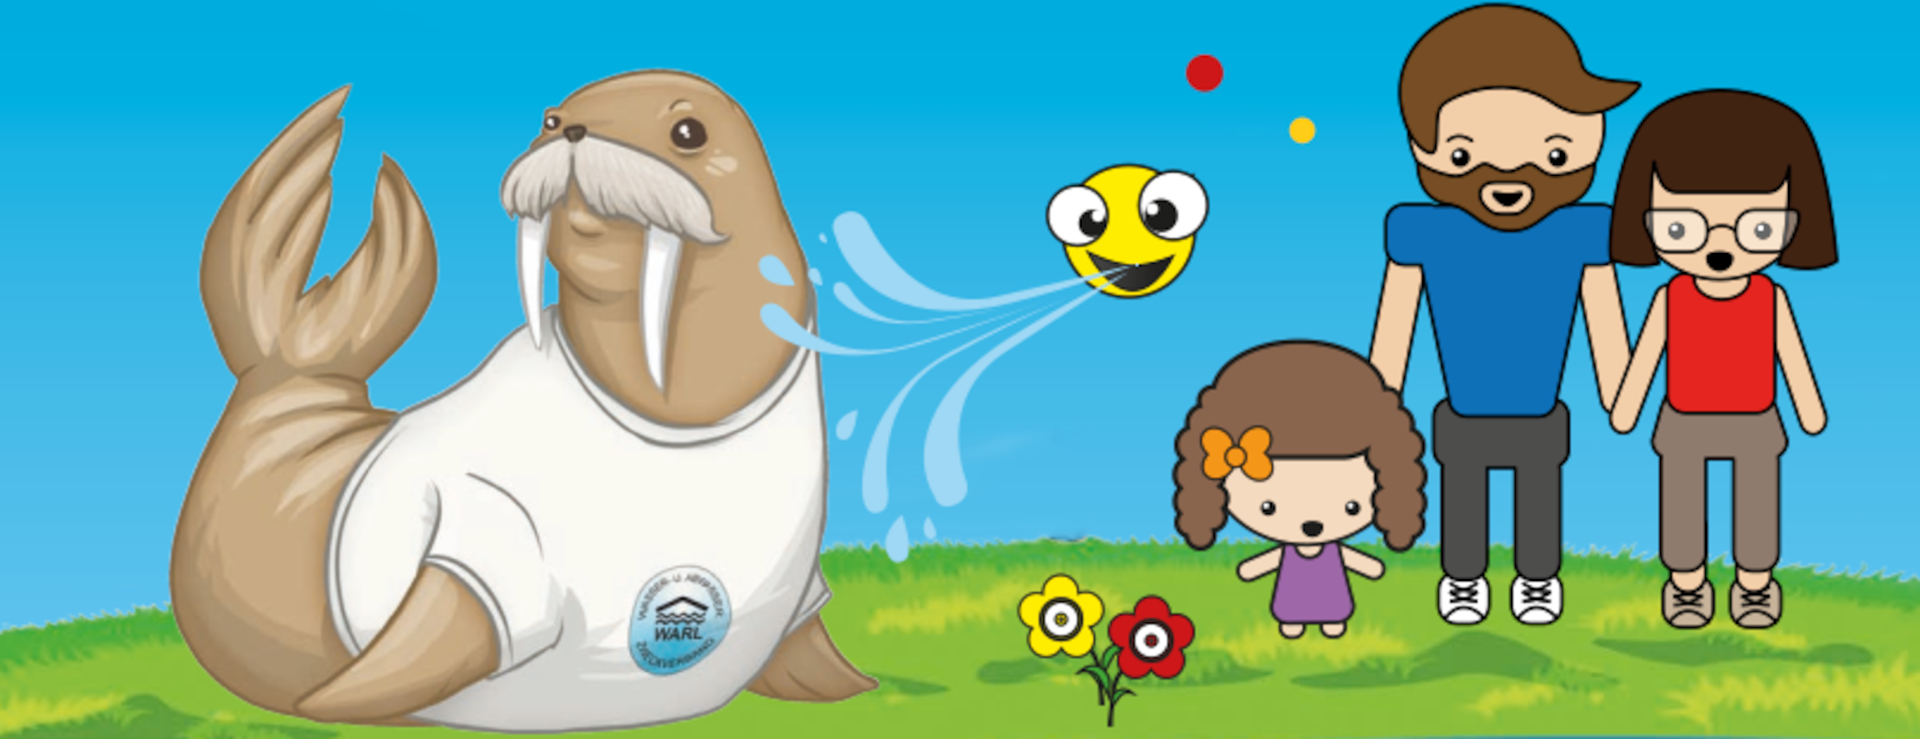 Kinderwassertag 2020